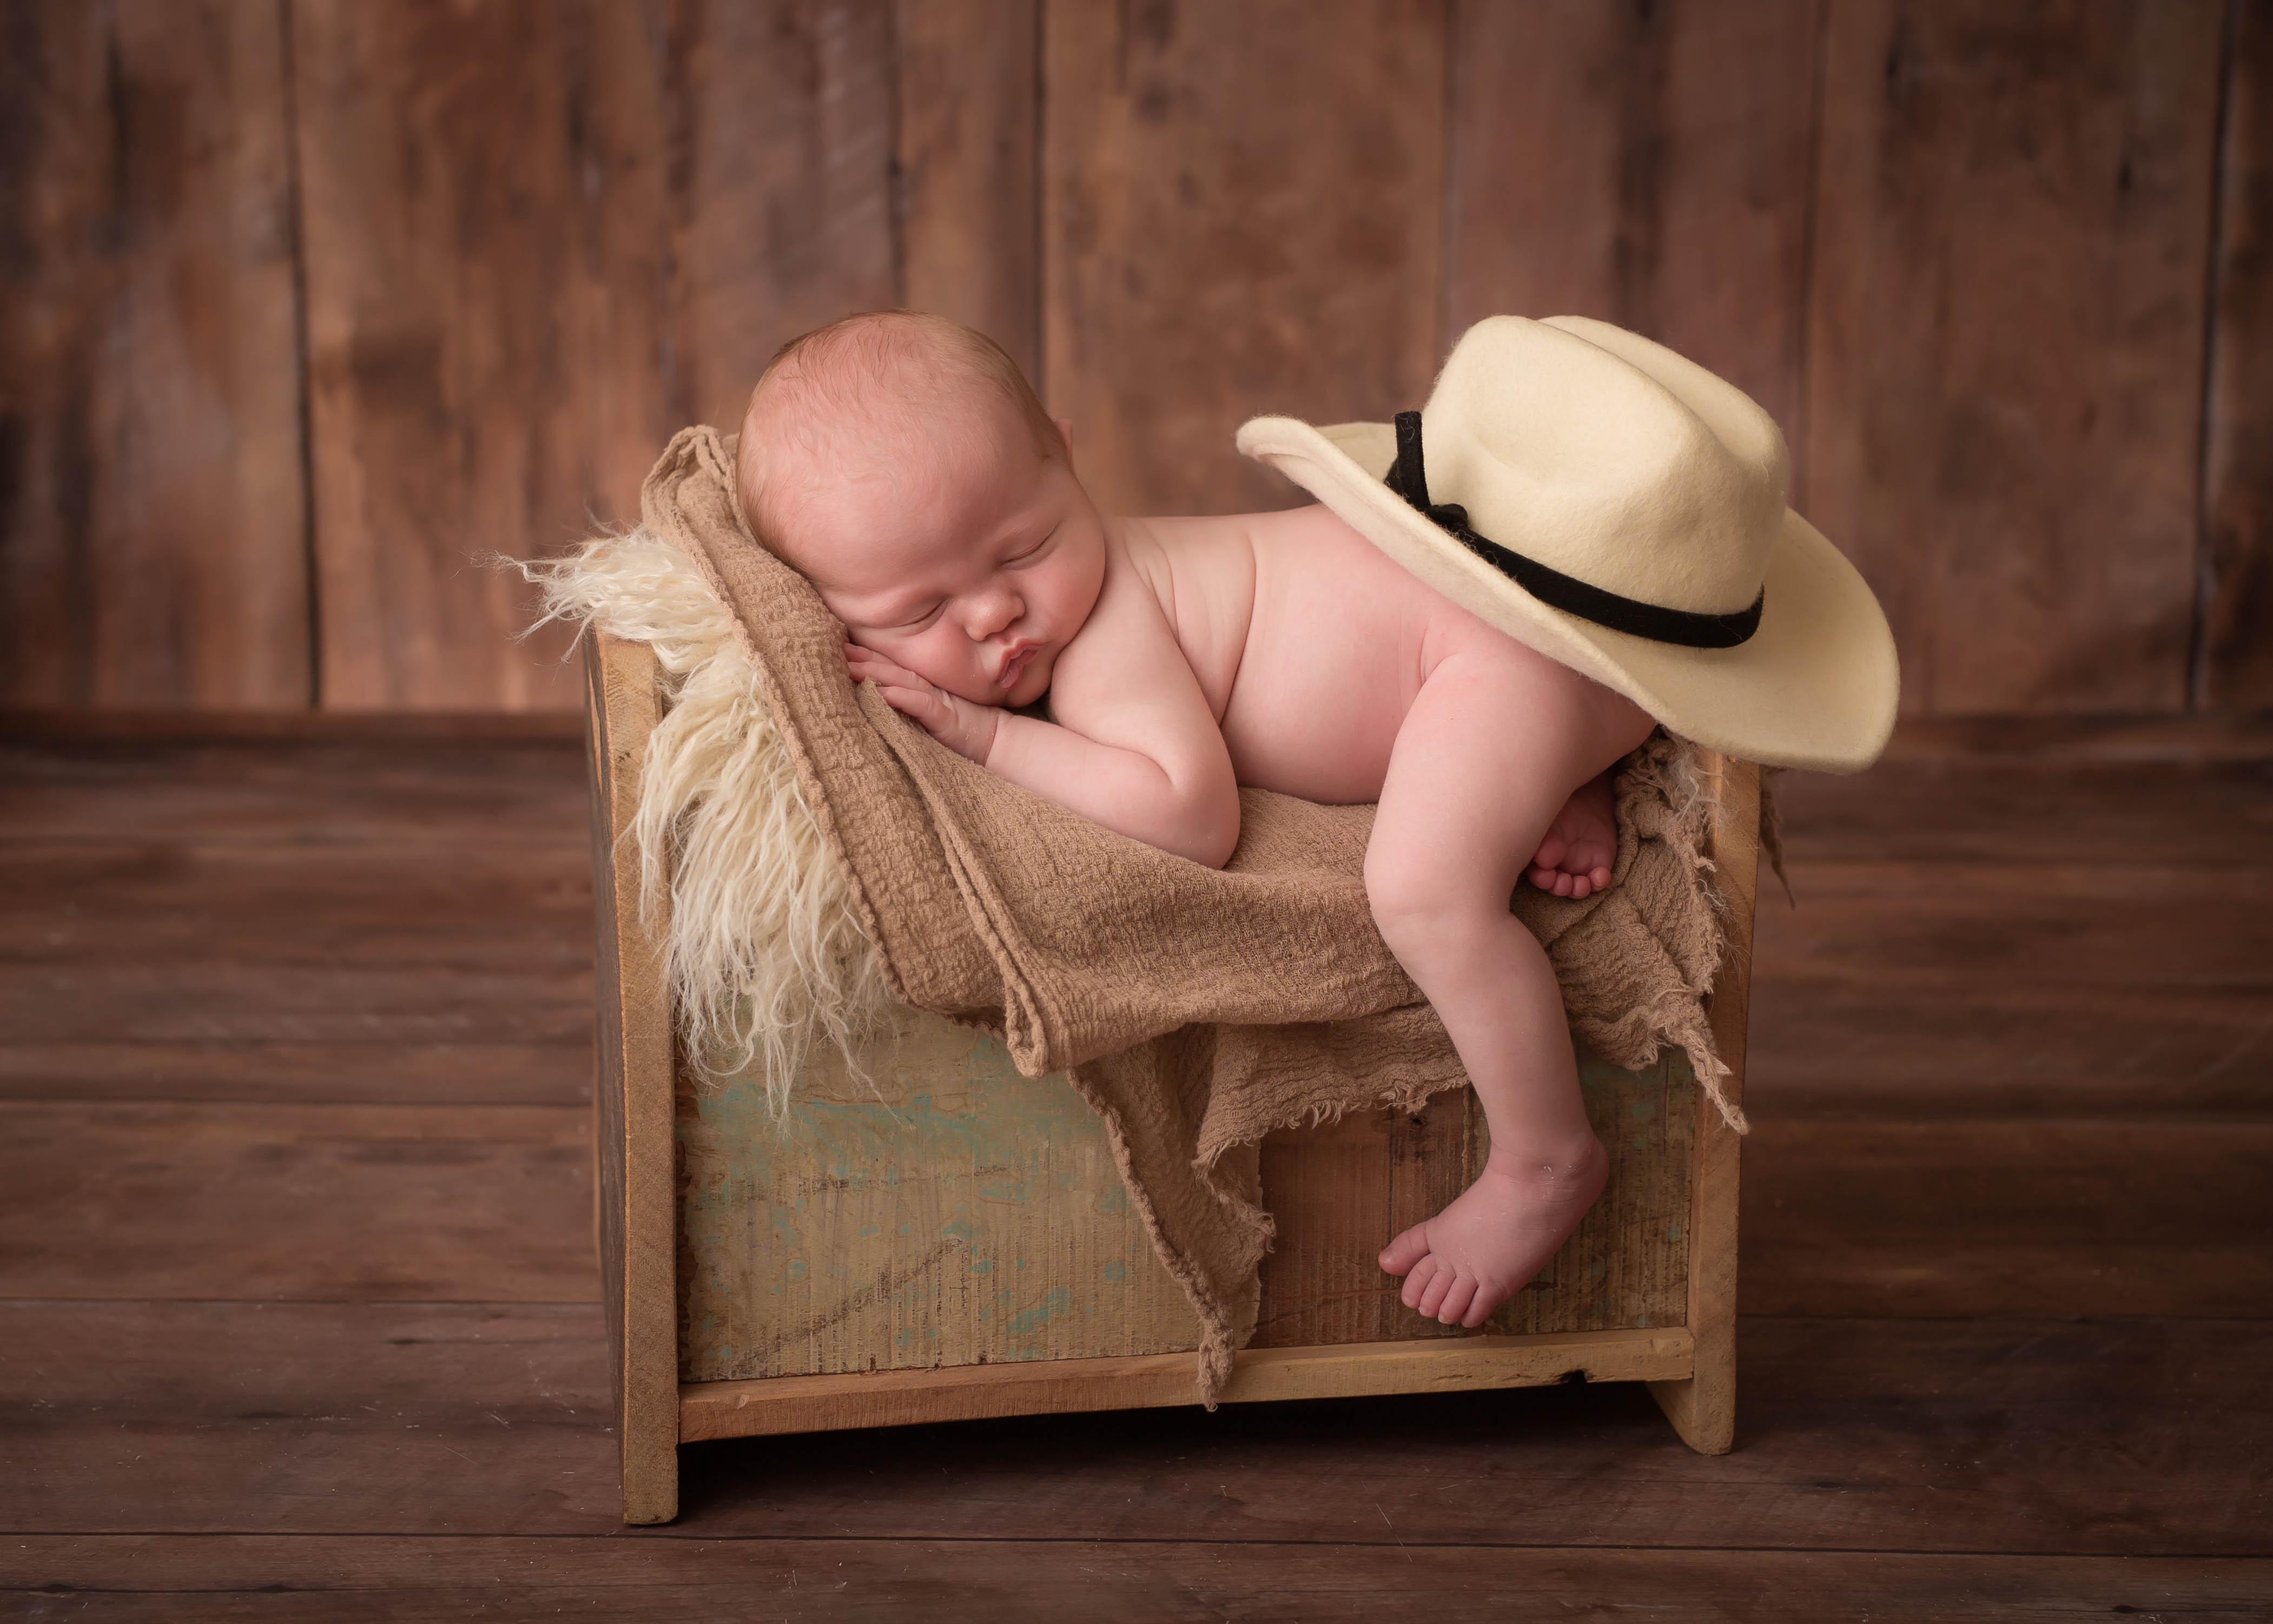 South-Florida-Newborn-Photographer-Jozgirli-Photography-1-1-of-1